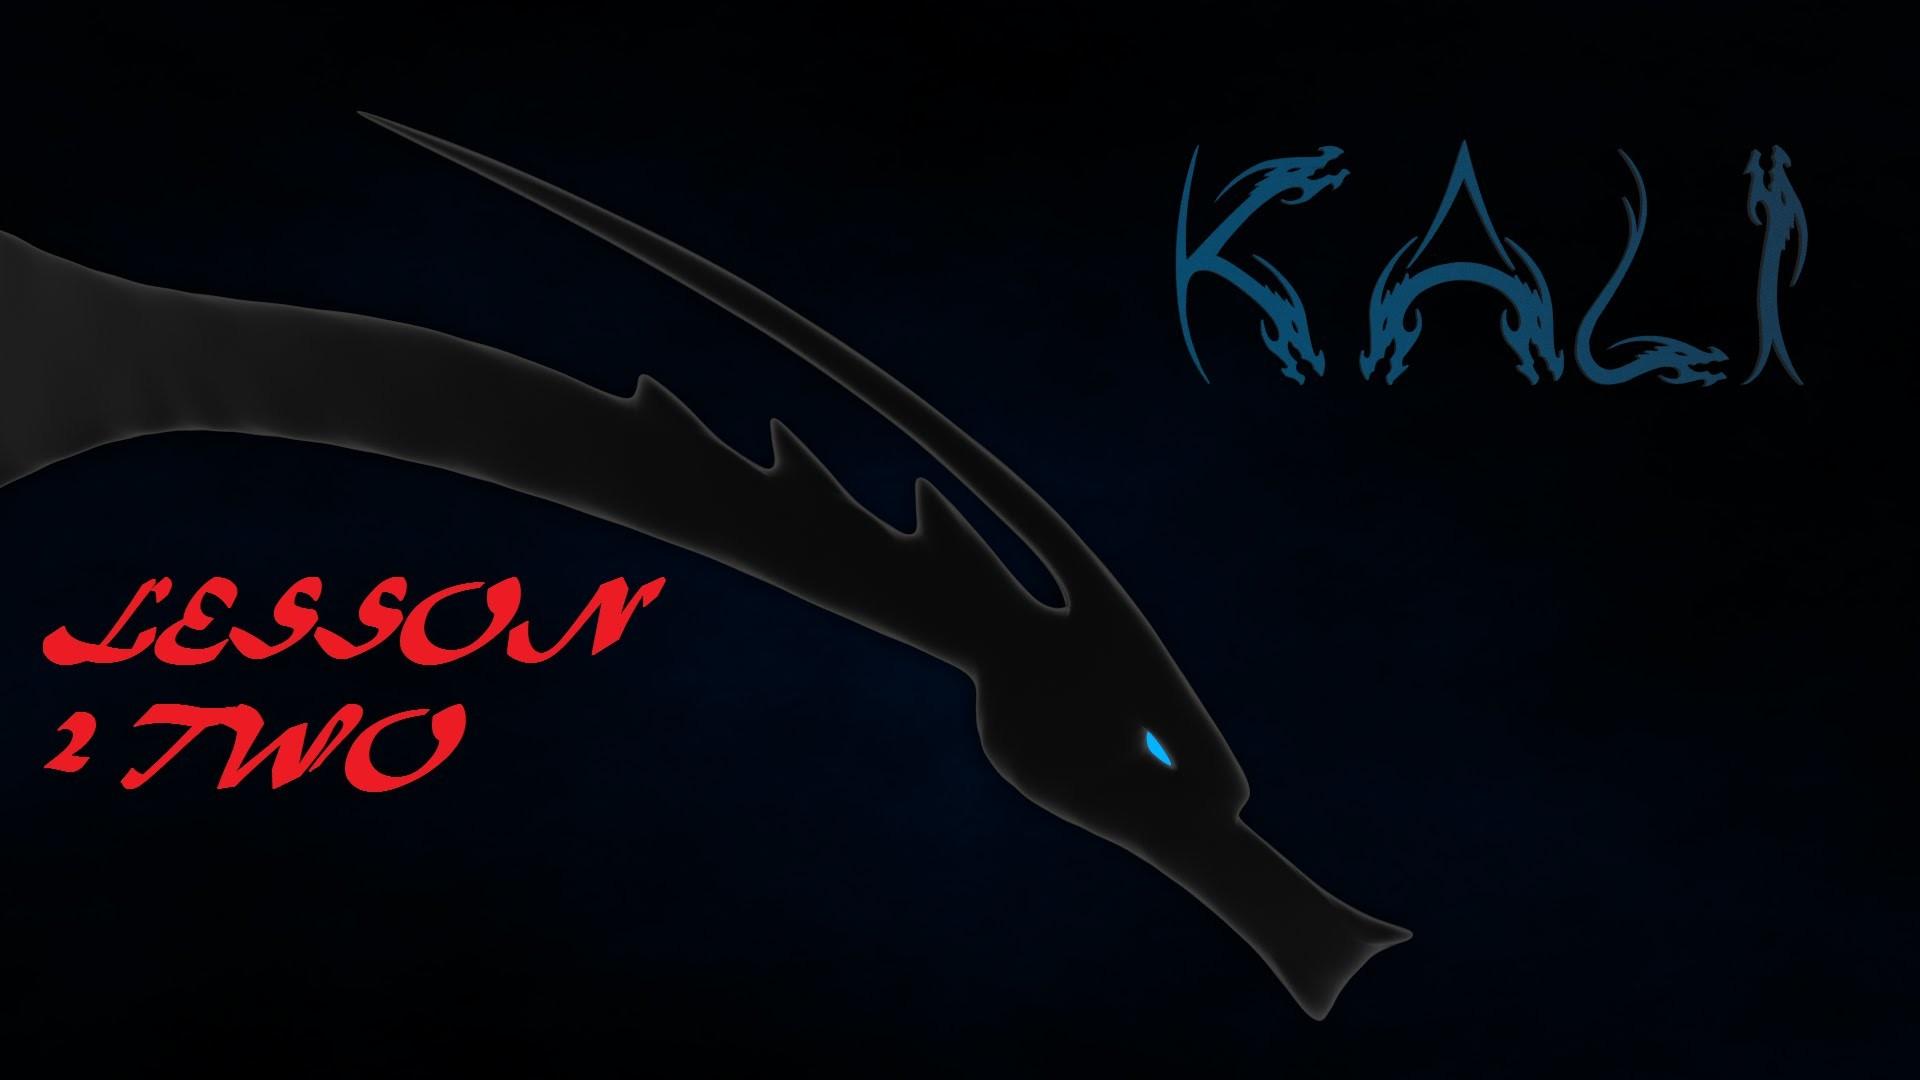 Kali Linux – Lesson 2 – DDOS